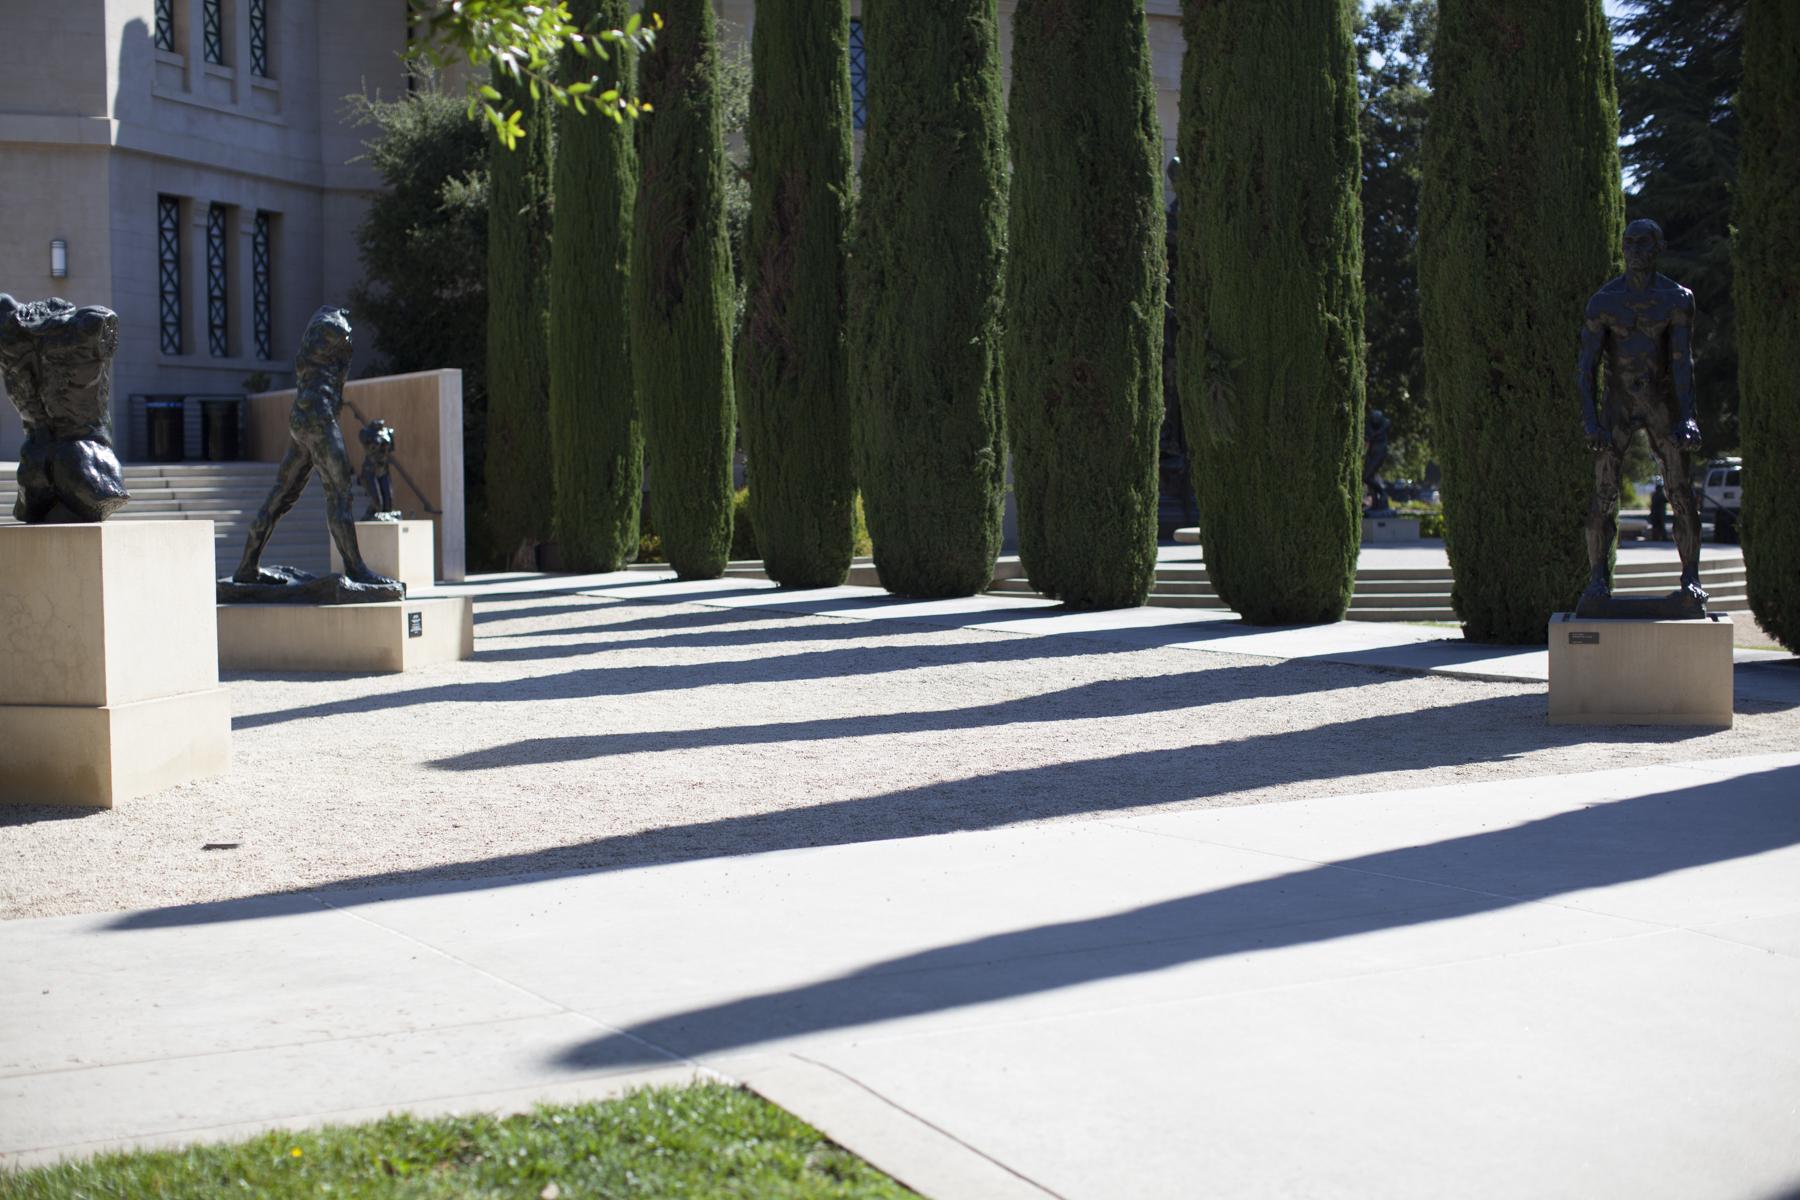 Stanford-IG-0070.jpg